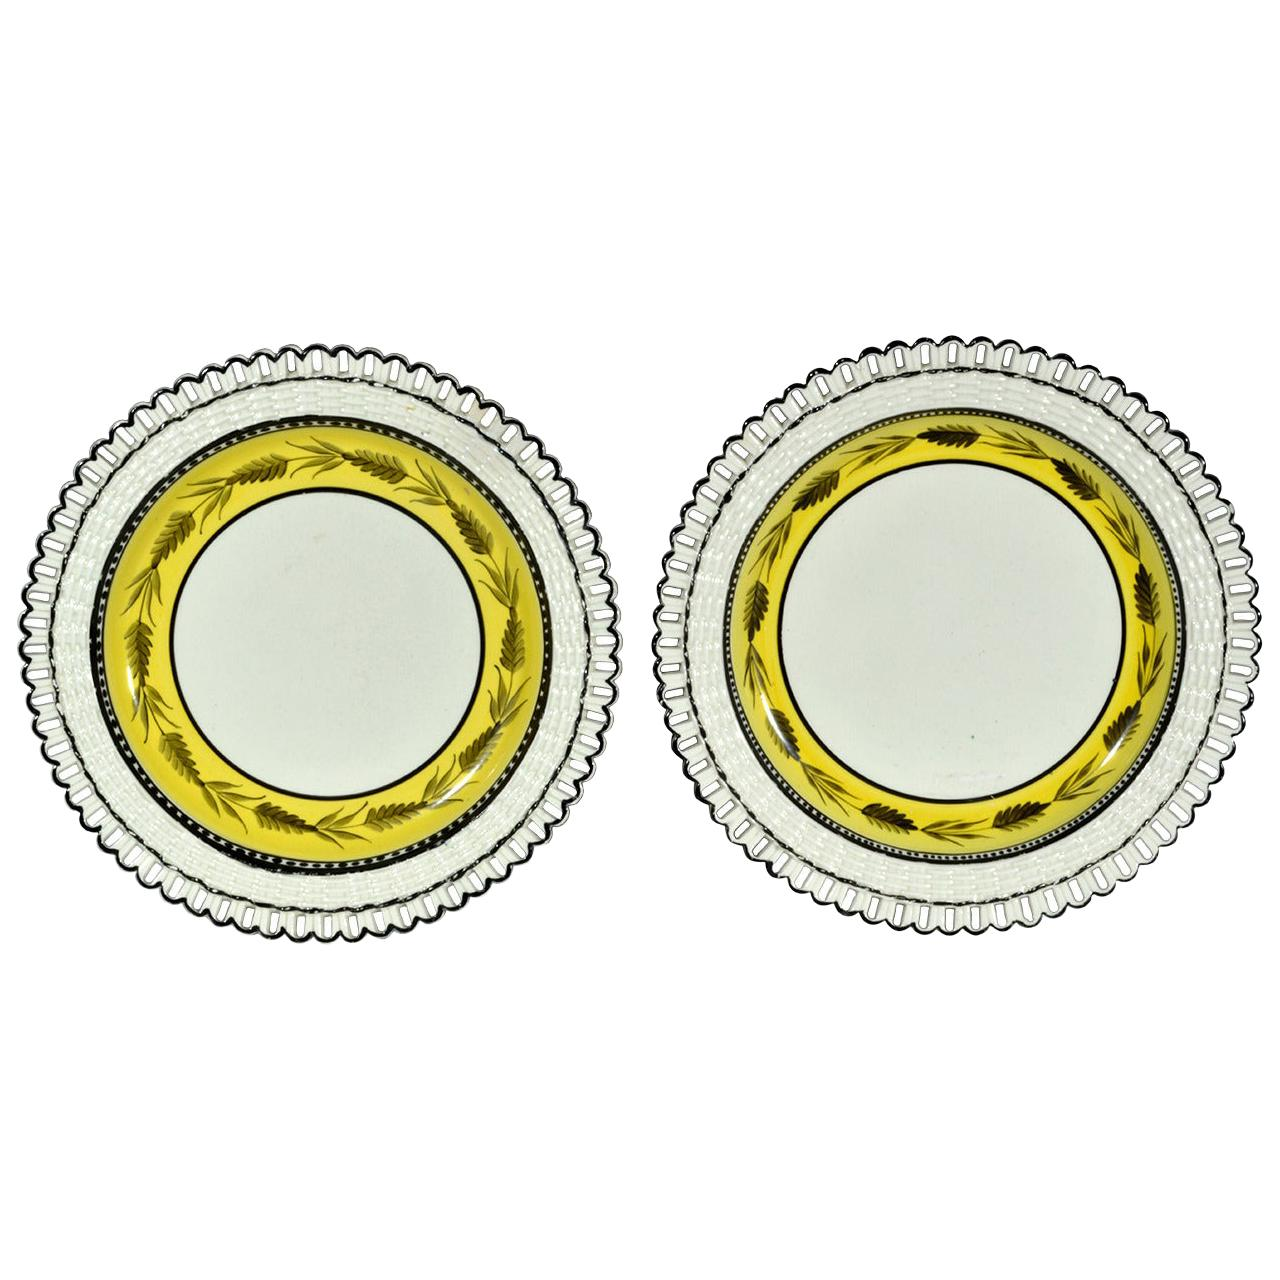 Liverpool Herculaneum Yellow-Banded Openwork Creamware Dessert Dishes